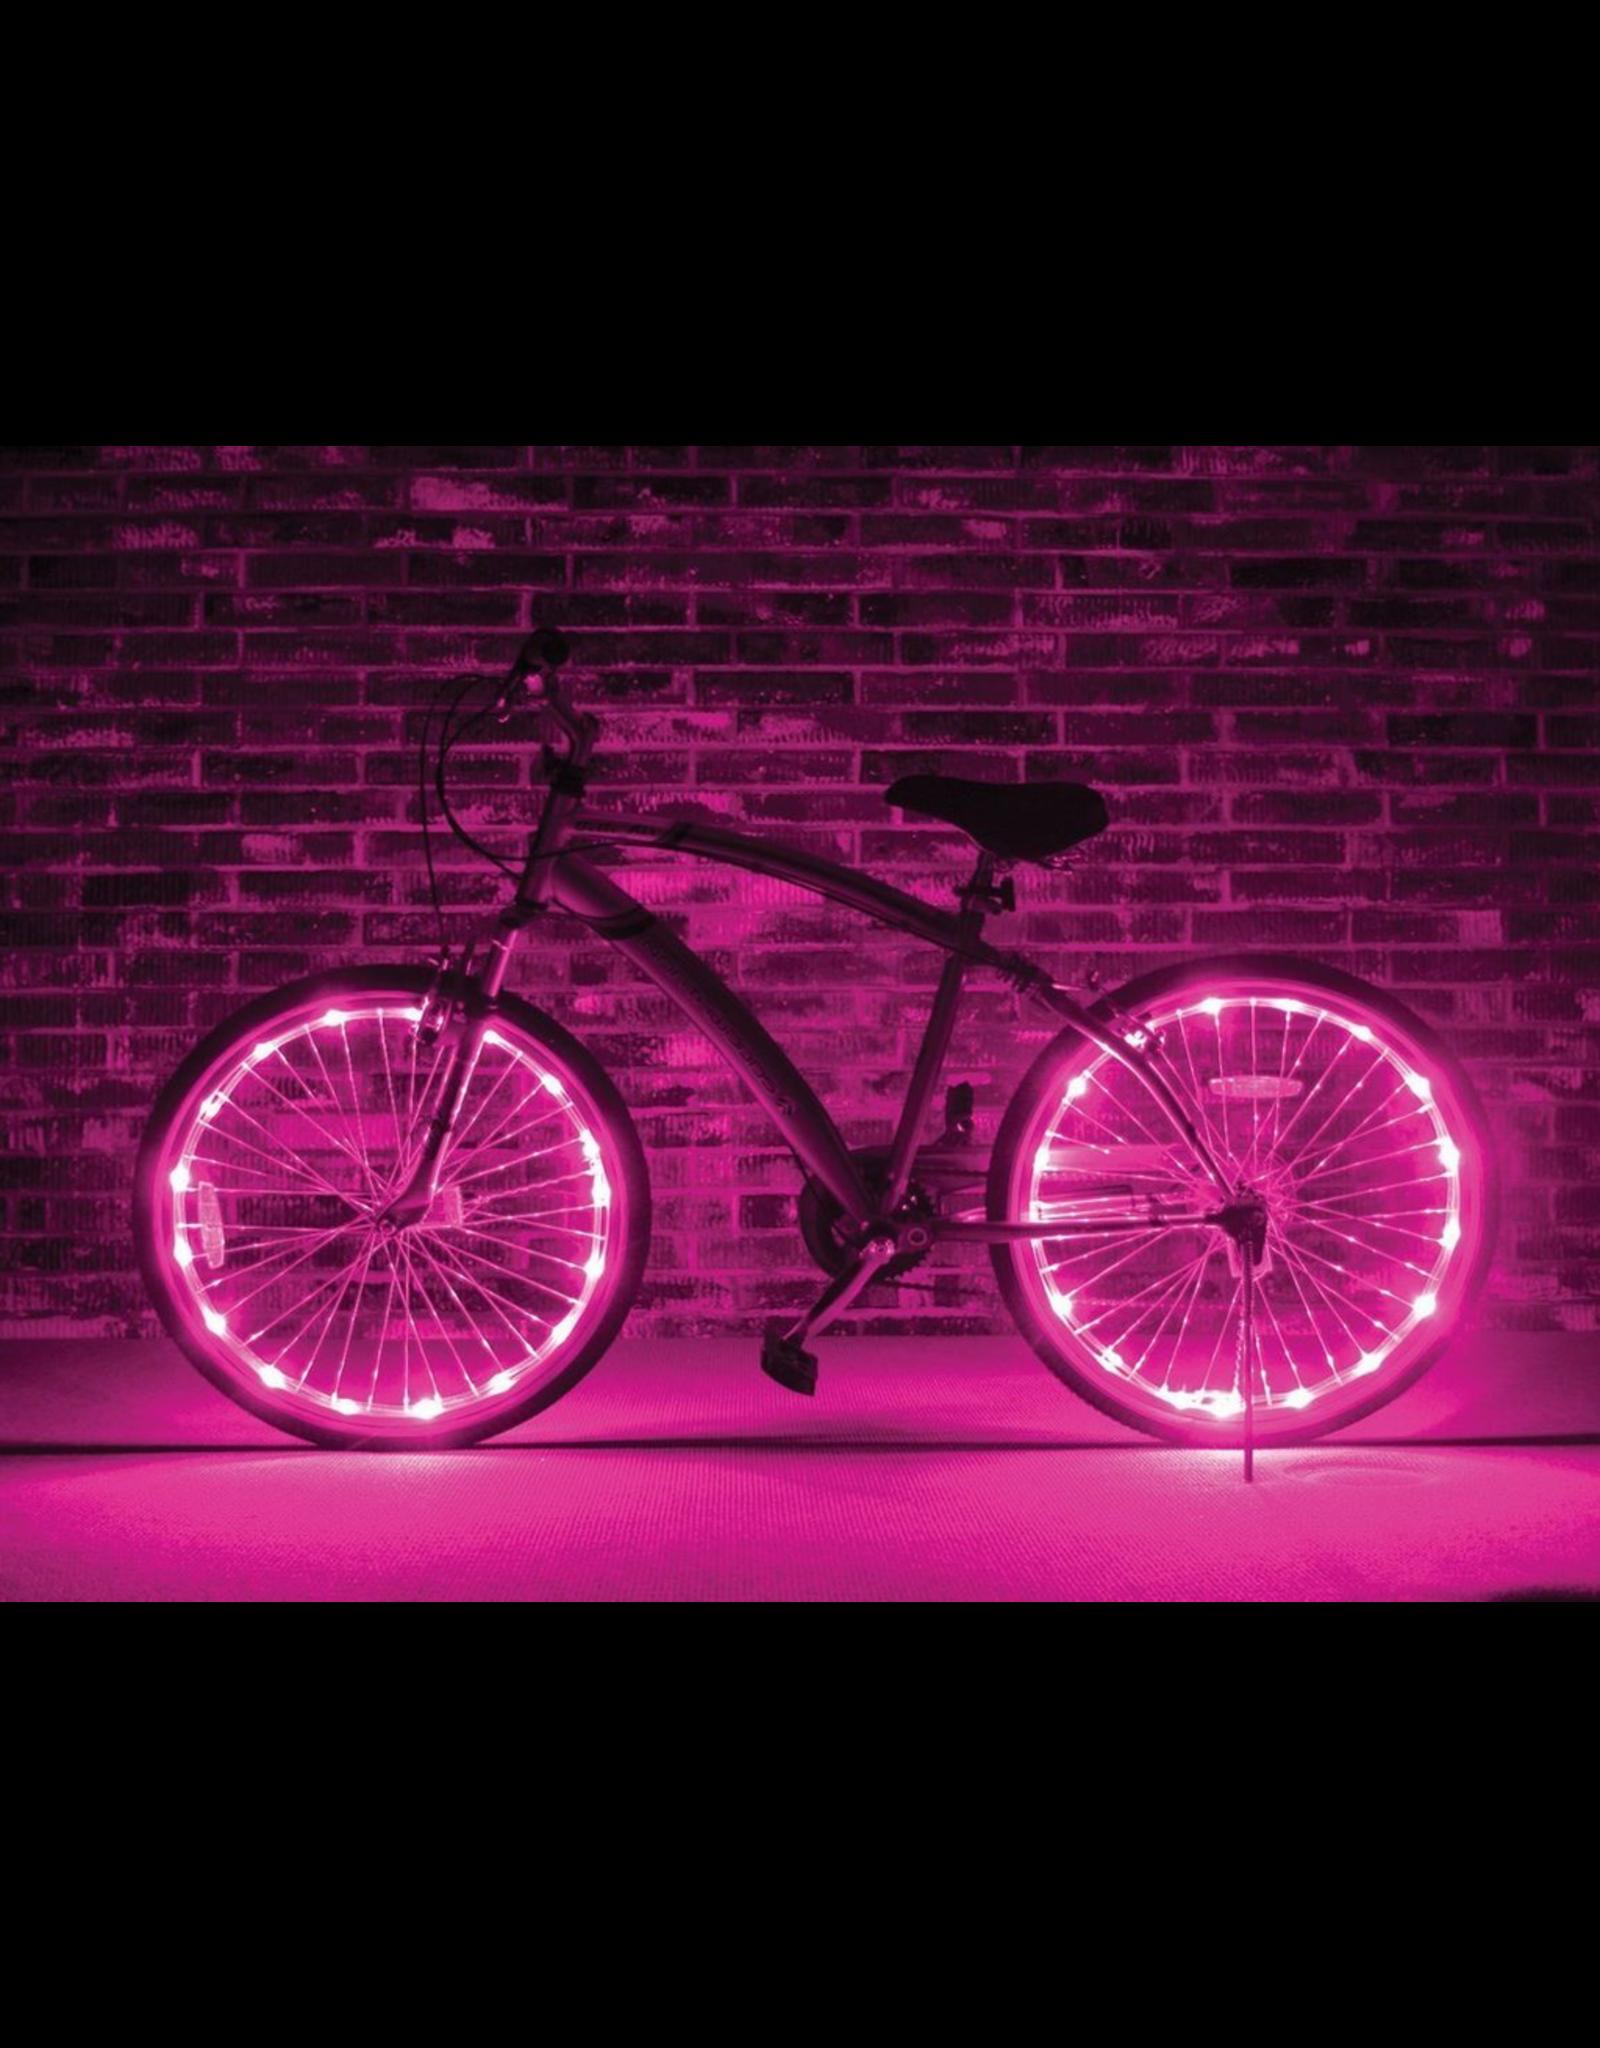 Brightz, Ltd. Wheel Brightz LED Lights - Pink (ONE WHEEL)